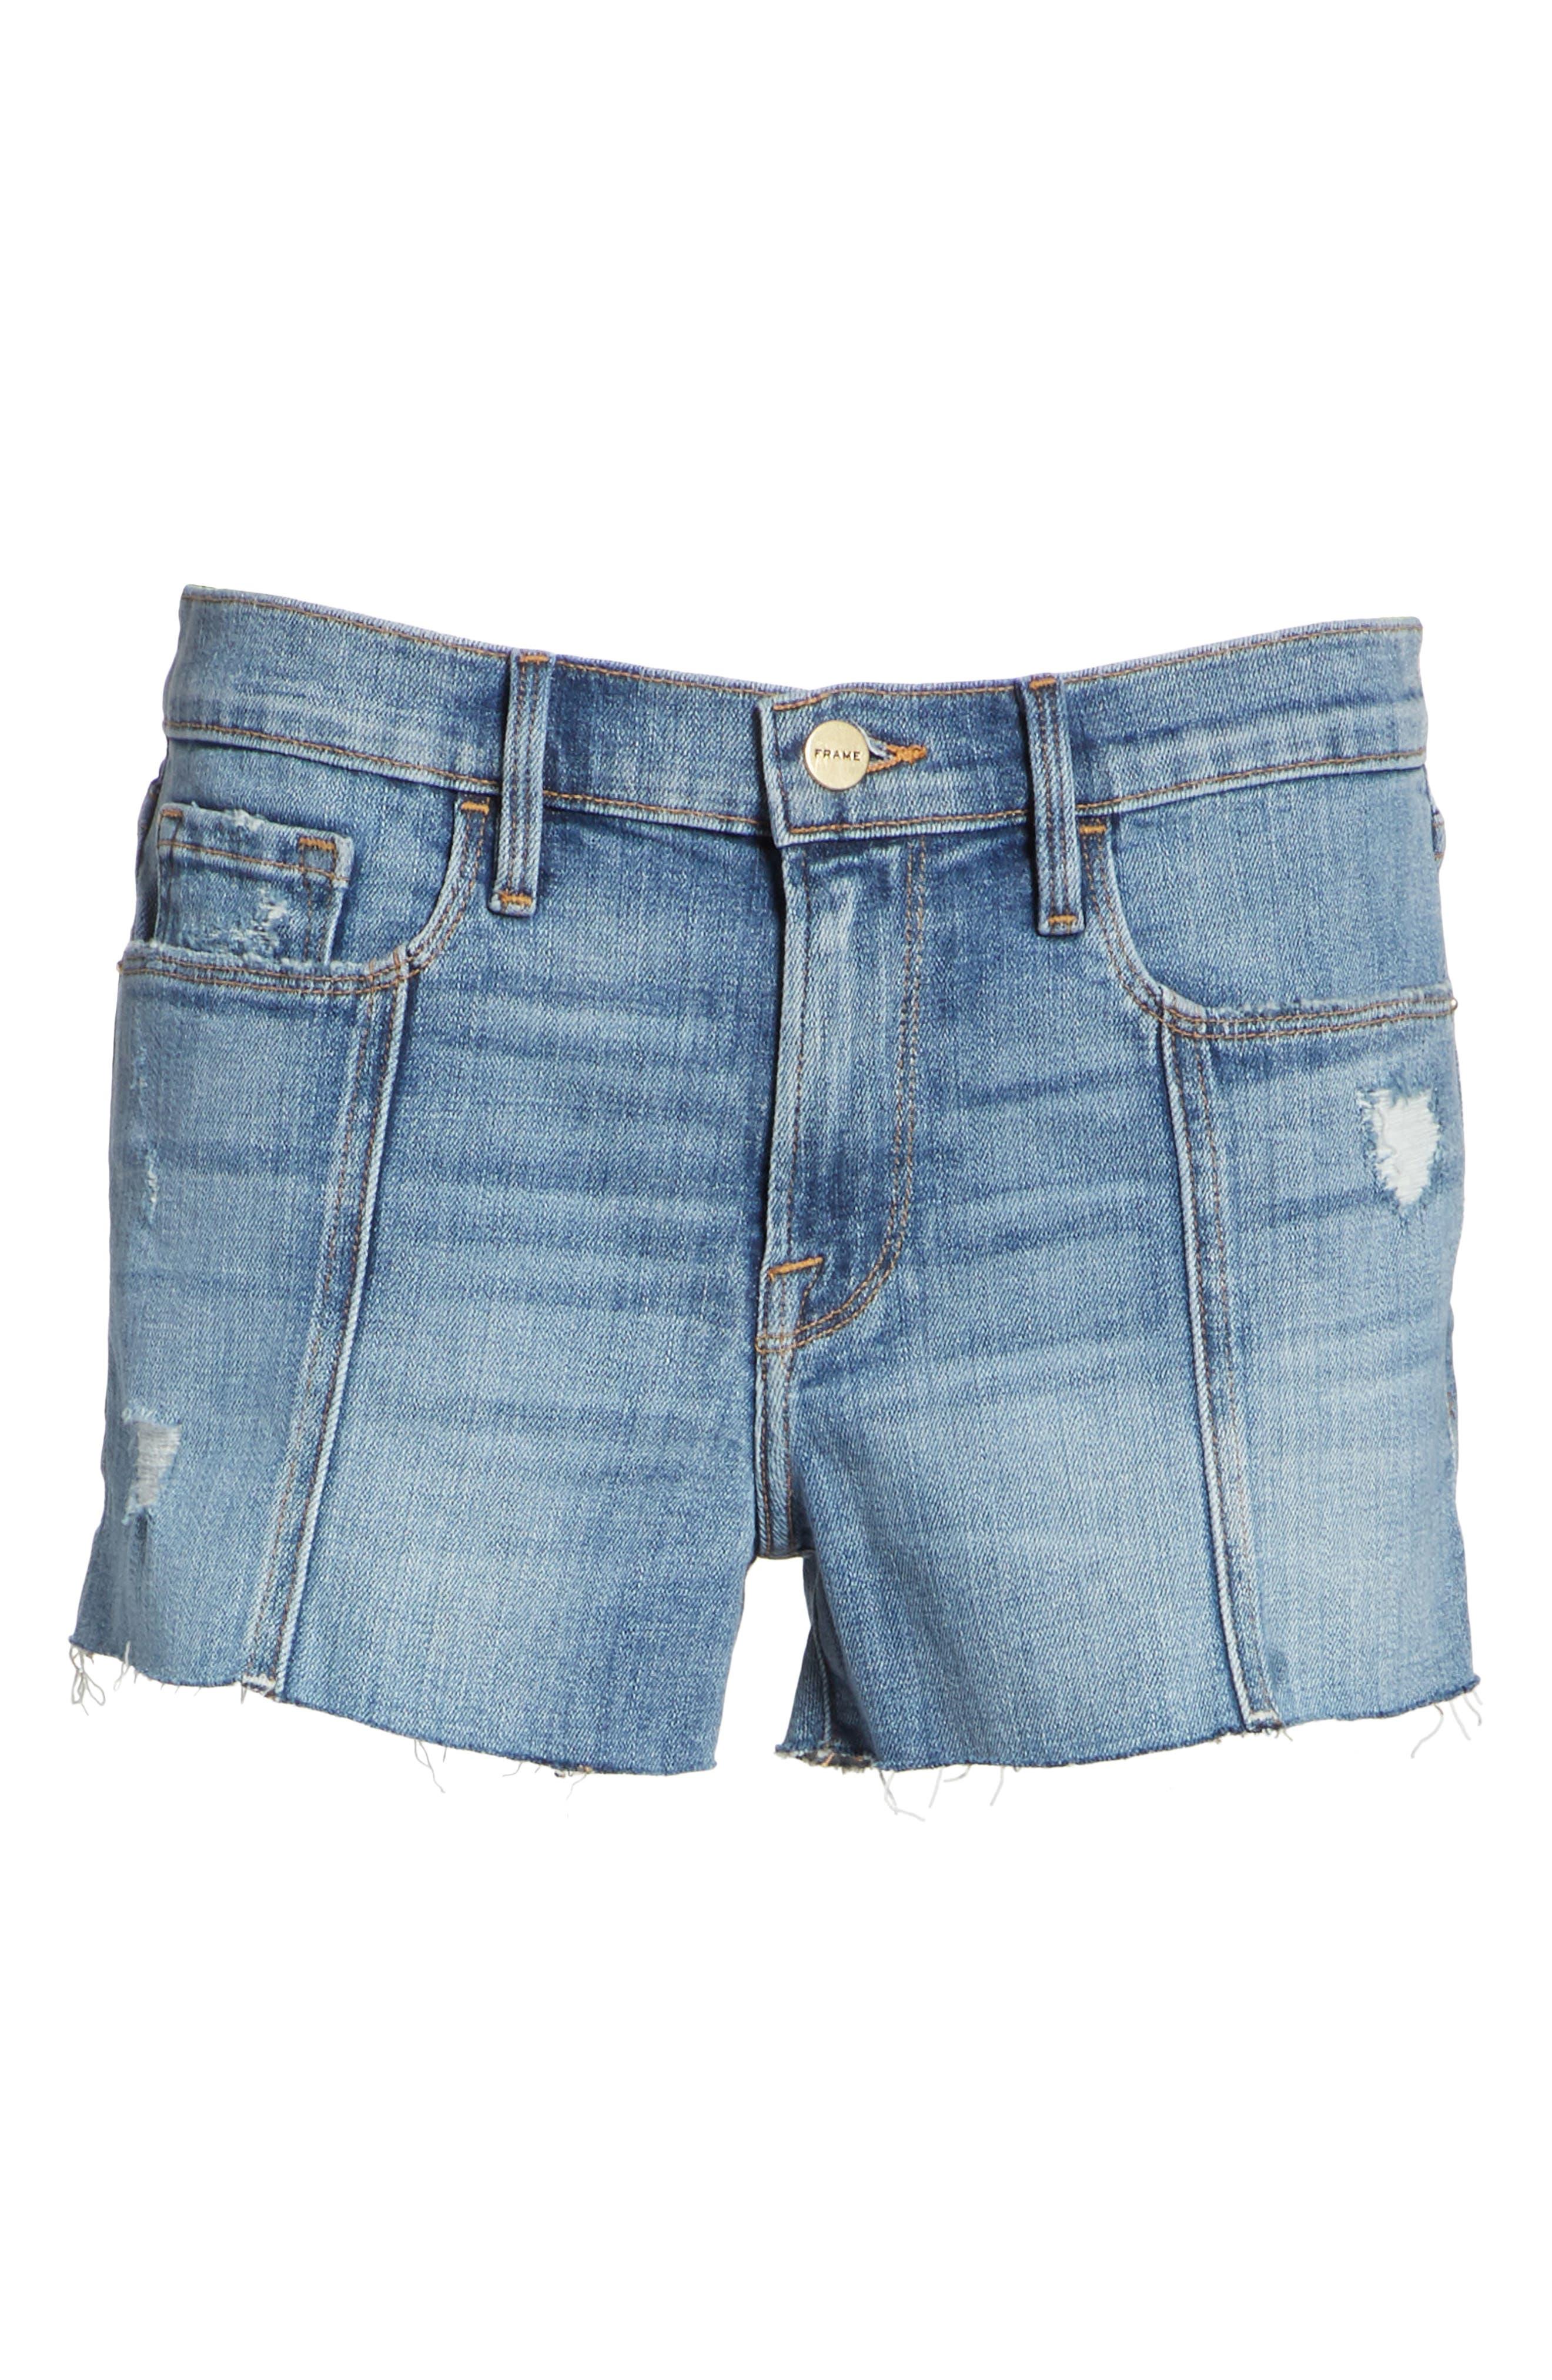 Le Cutoff Center Seam Denim Shorts,                             Alternate thumbnail 6, color,                             420